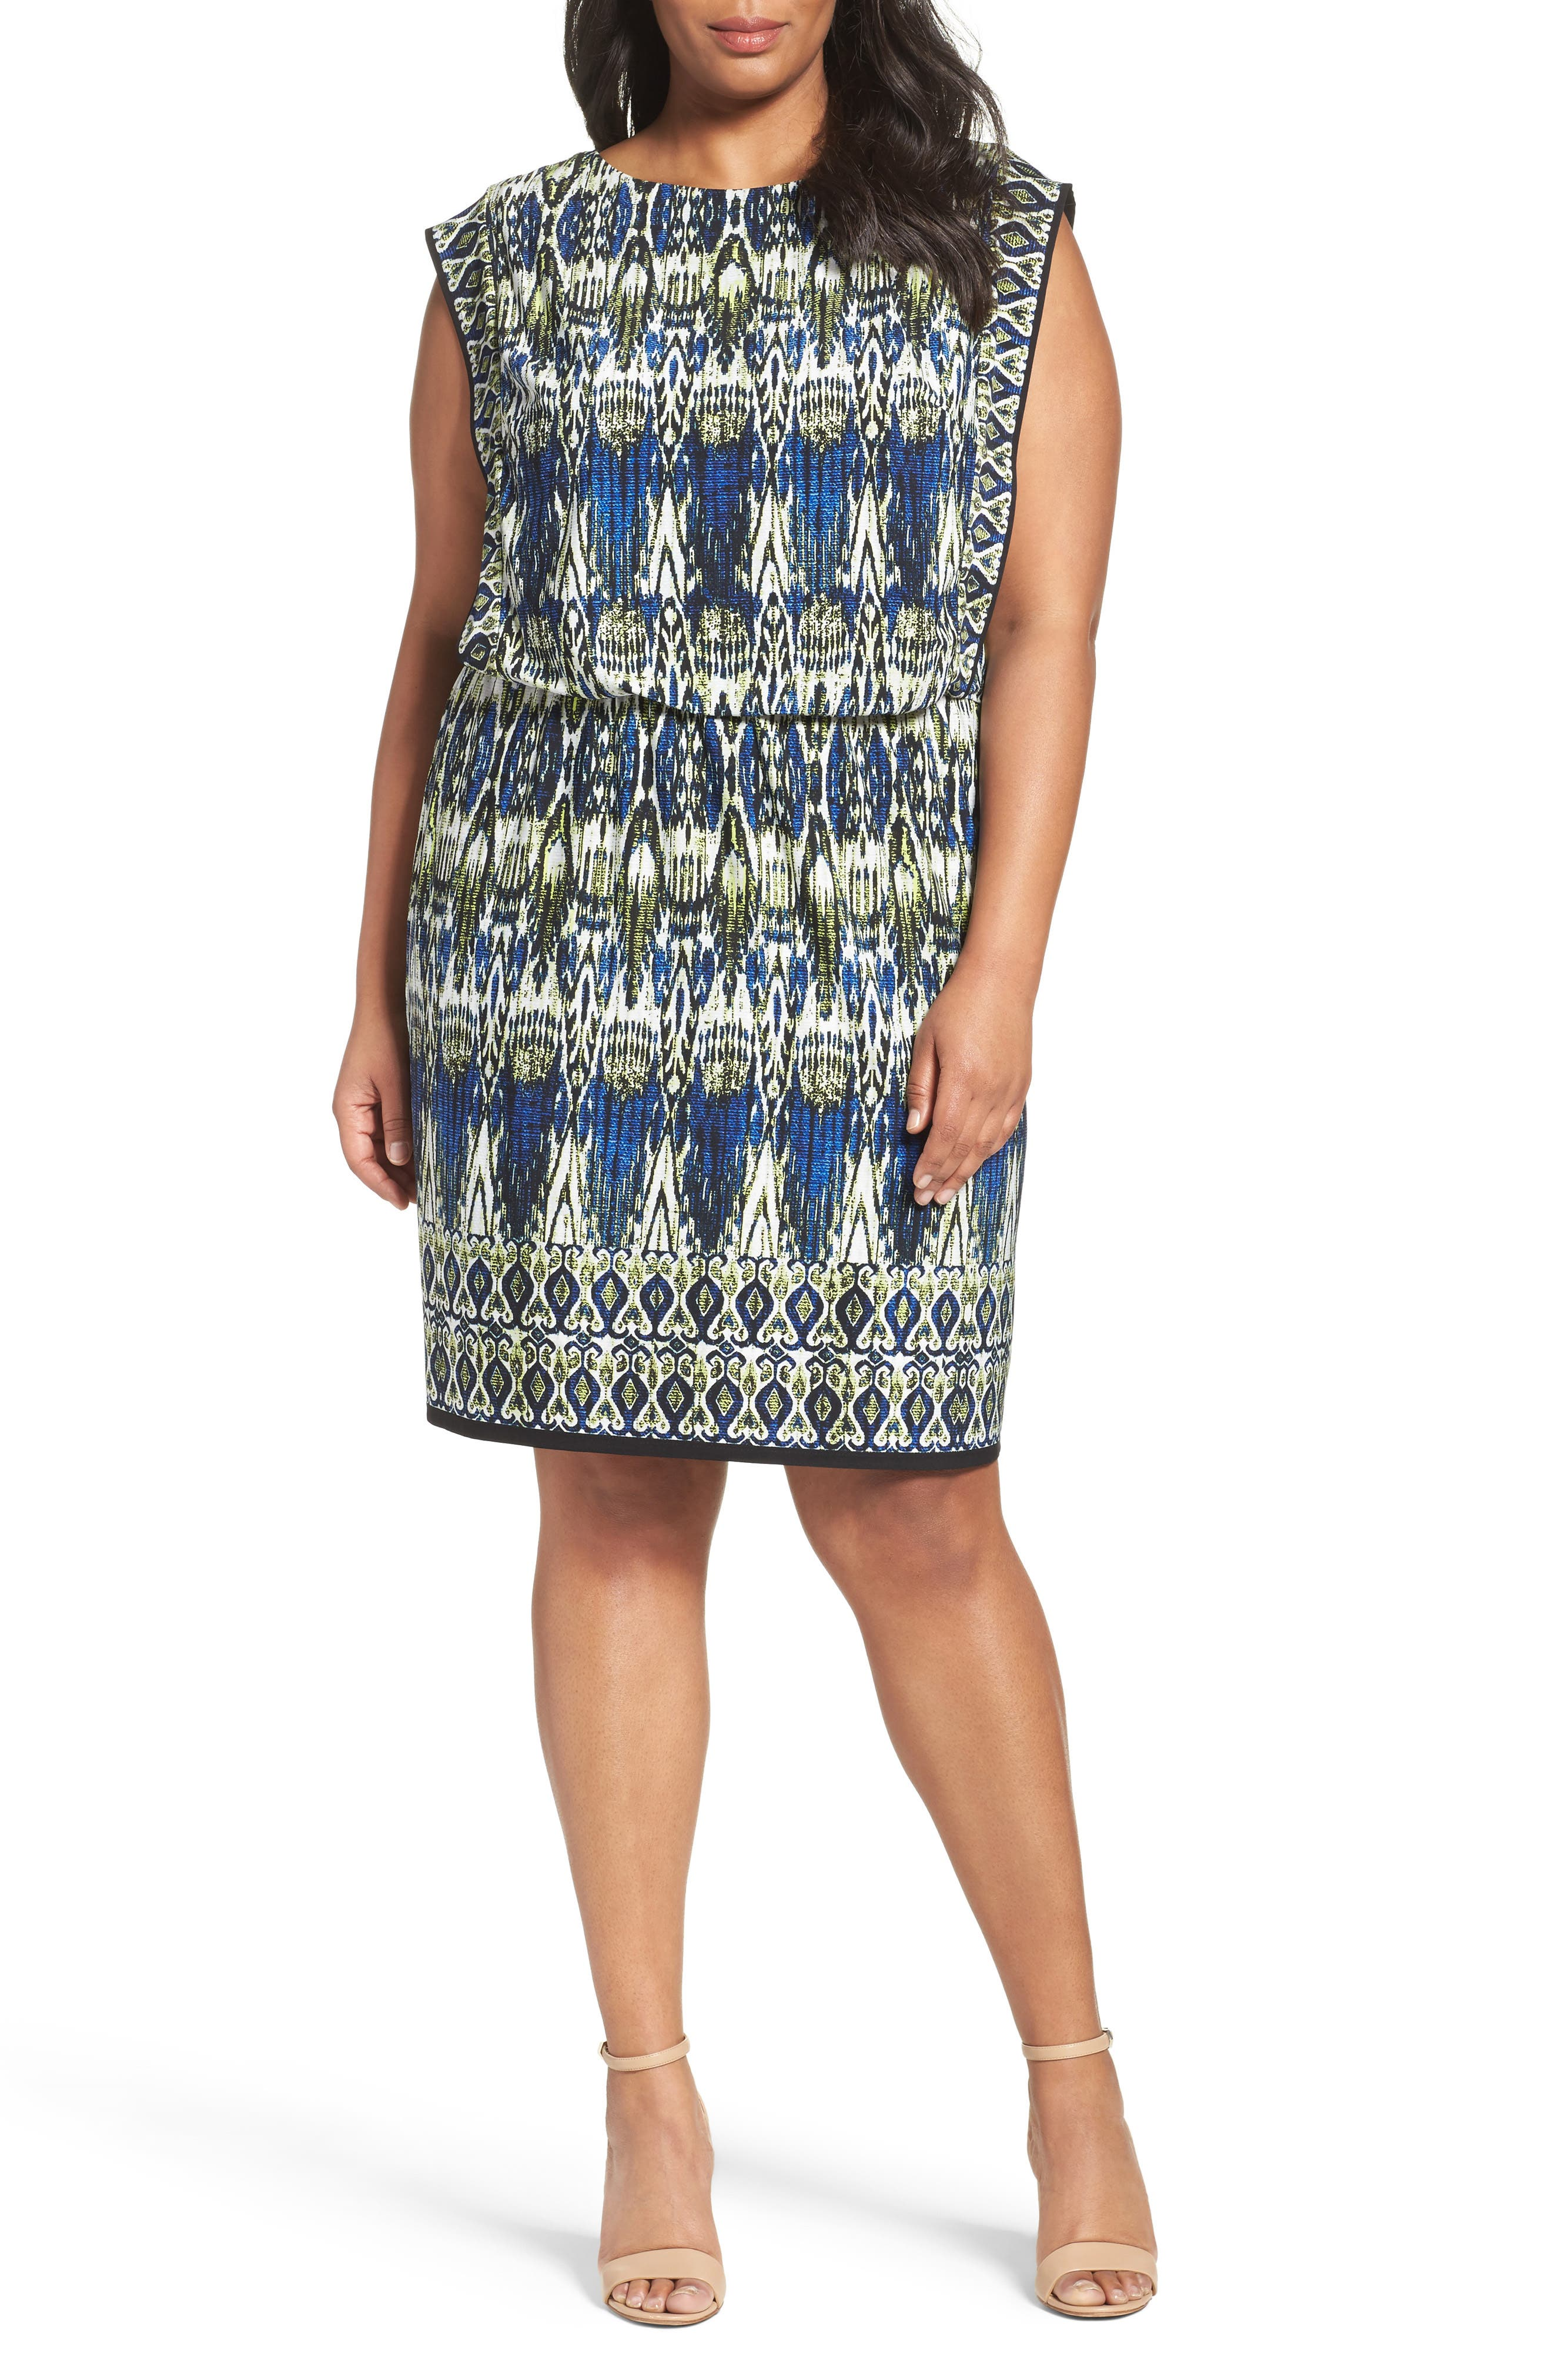 Alternate Image 1 Selected - London Times Print Jersey Blouson Dress (Plus Size)